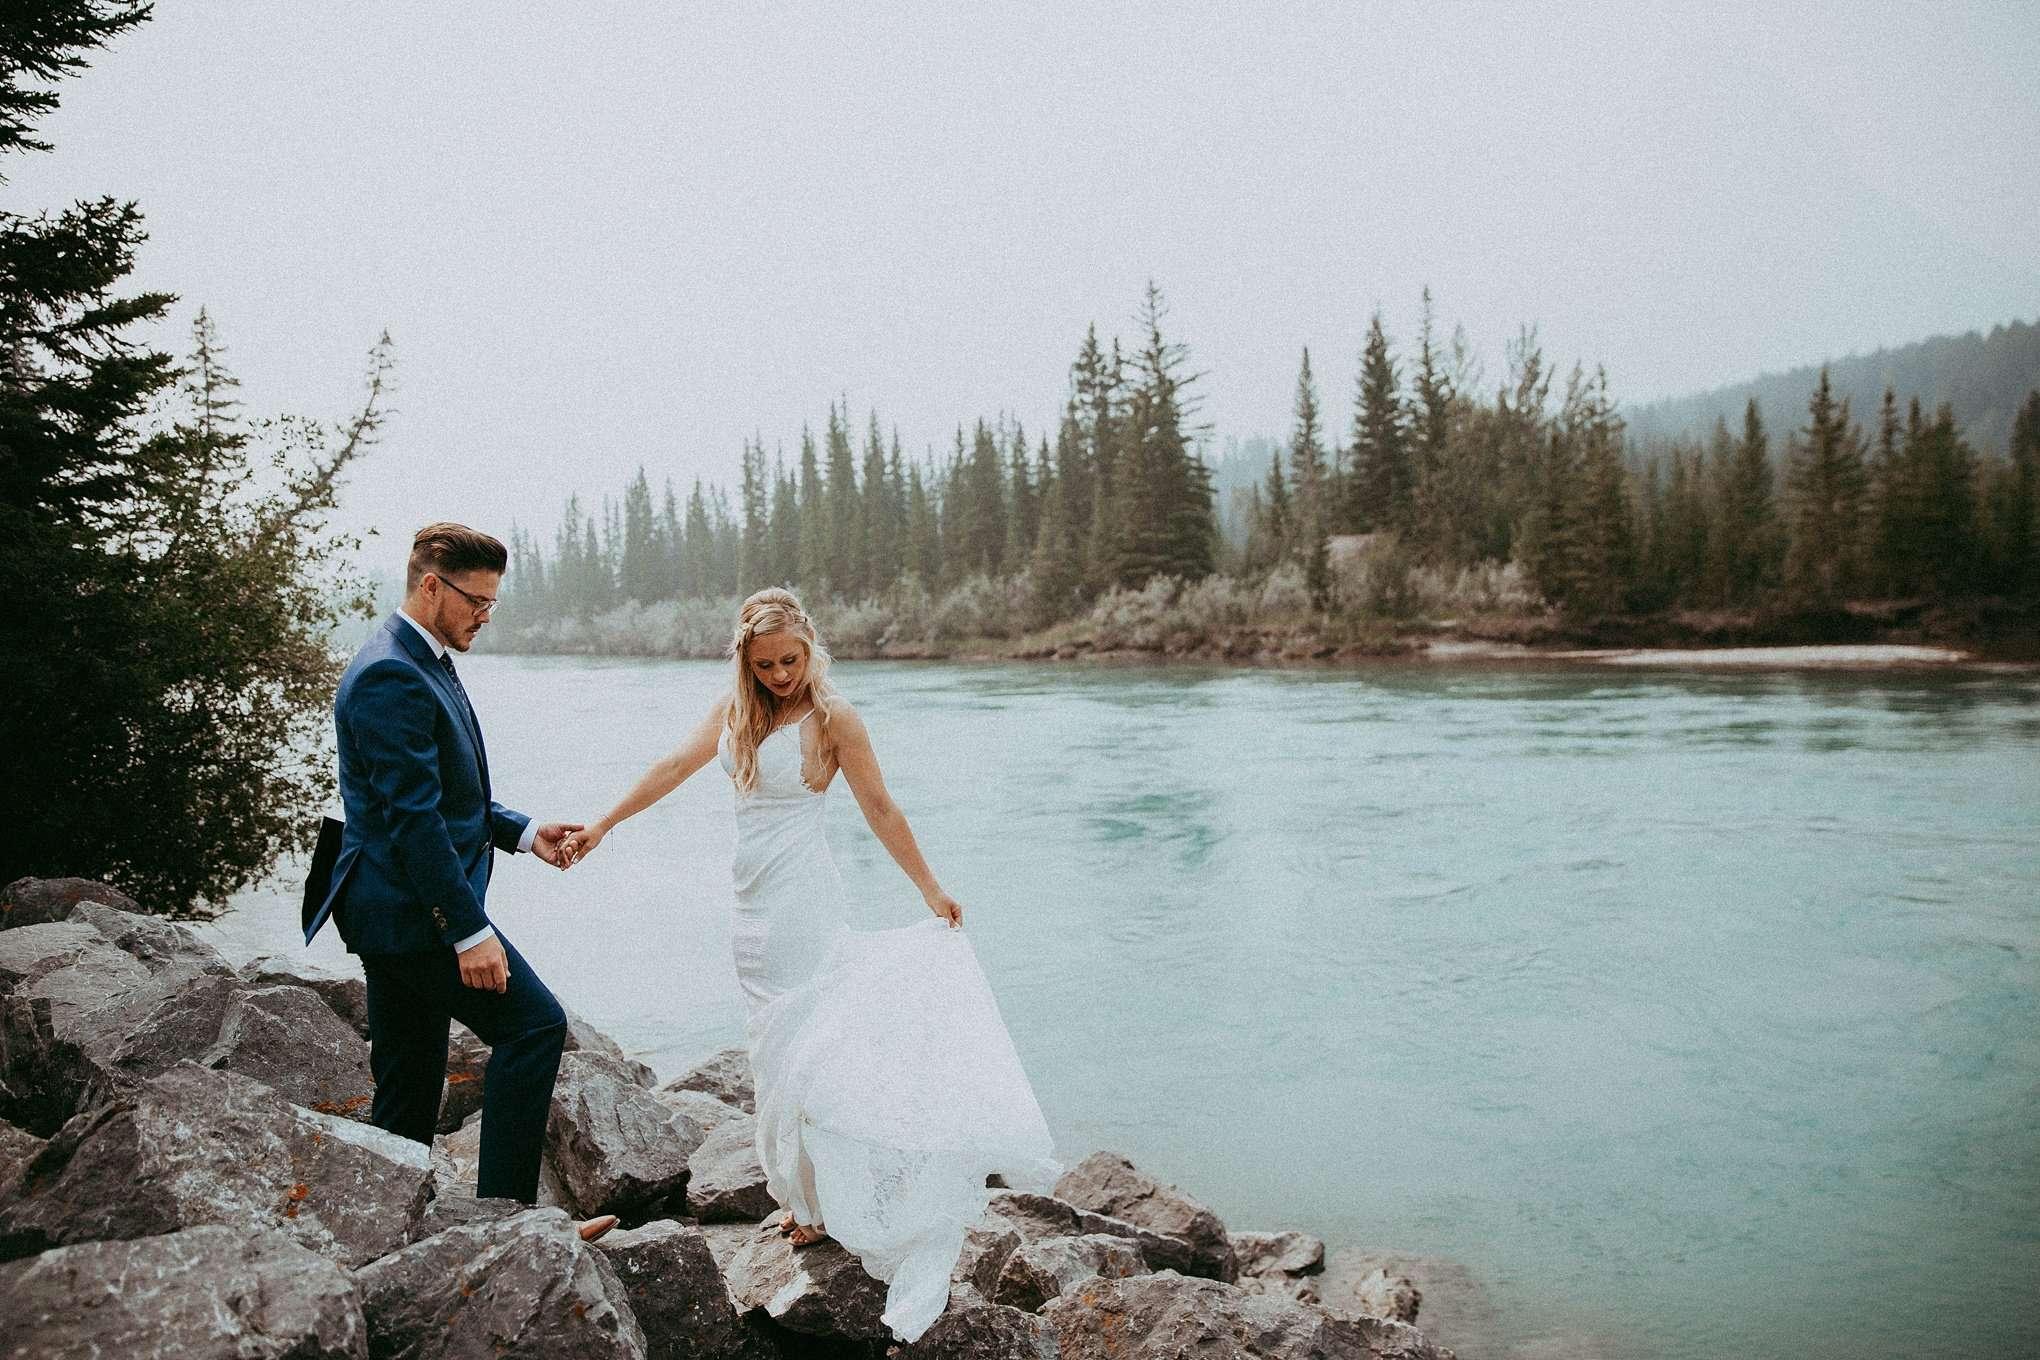 camore train bridge, canmore engine bridge, camore wedding photographers